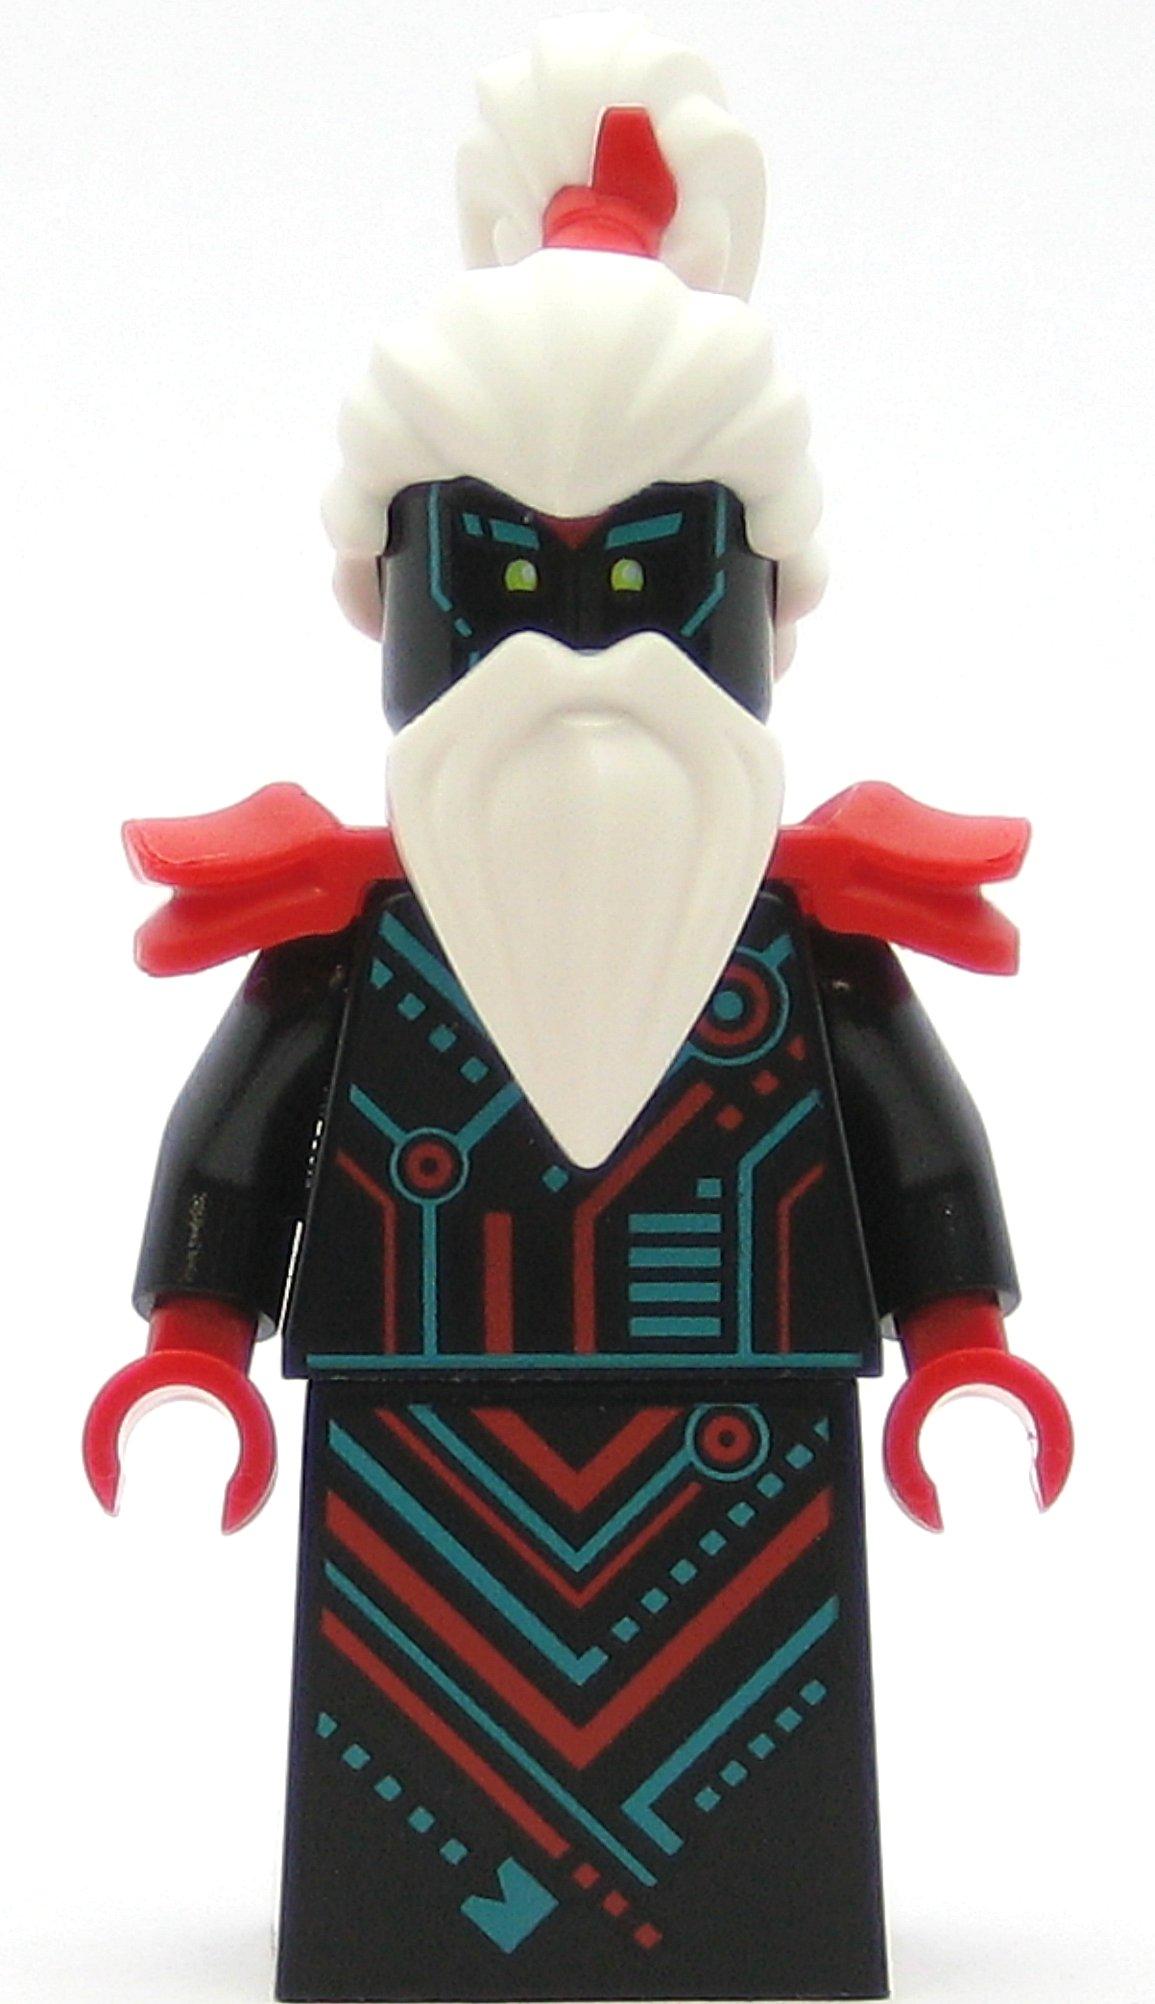 LEGO Ninjago Minifigure Unagami